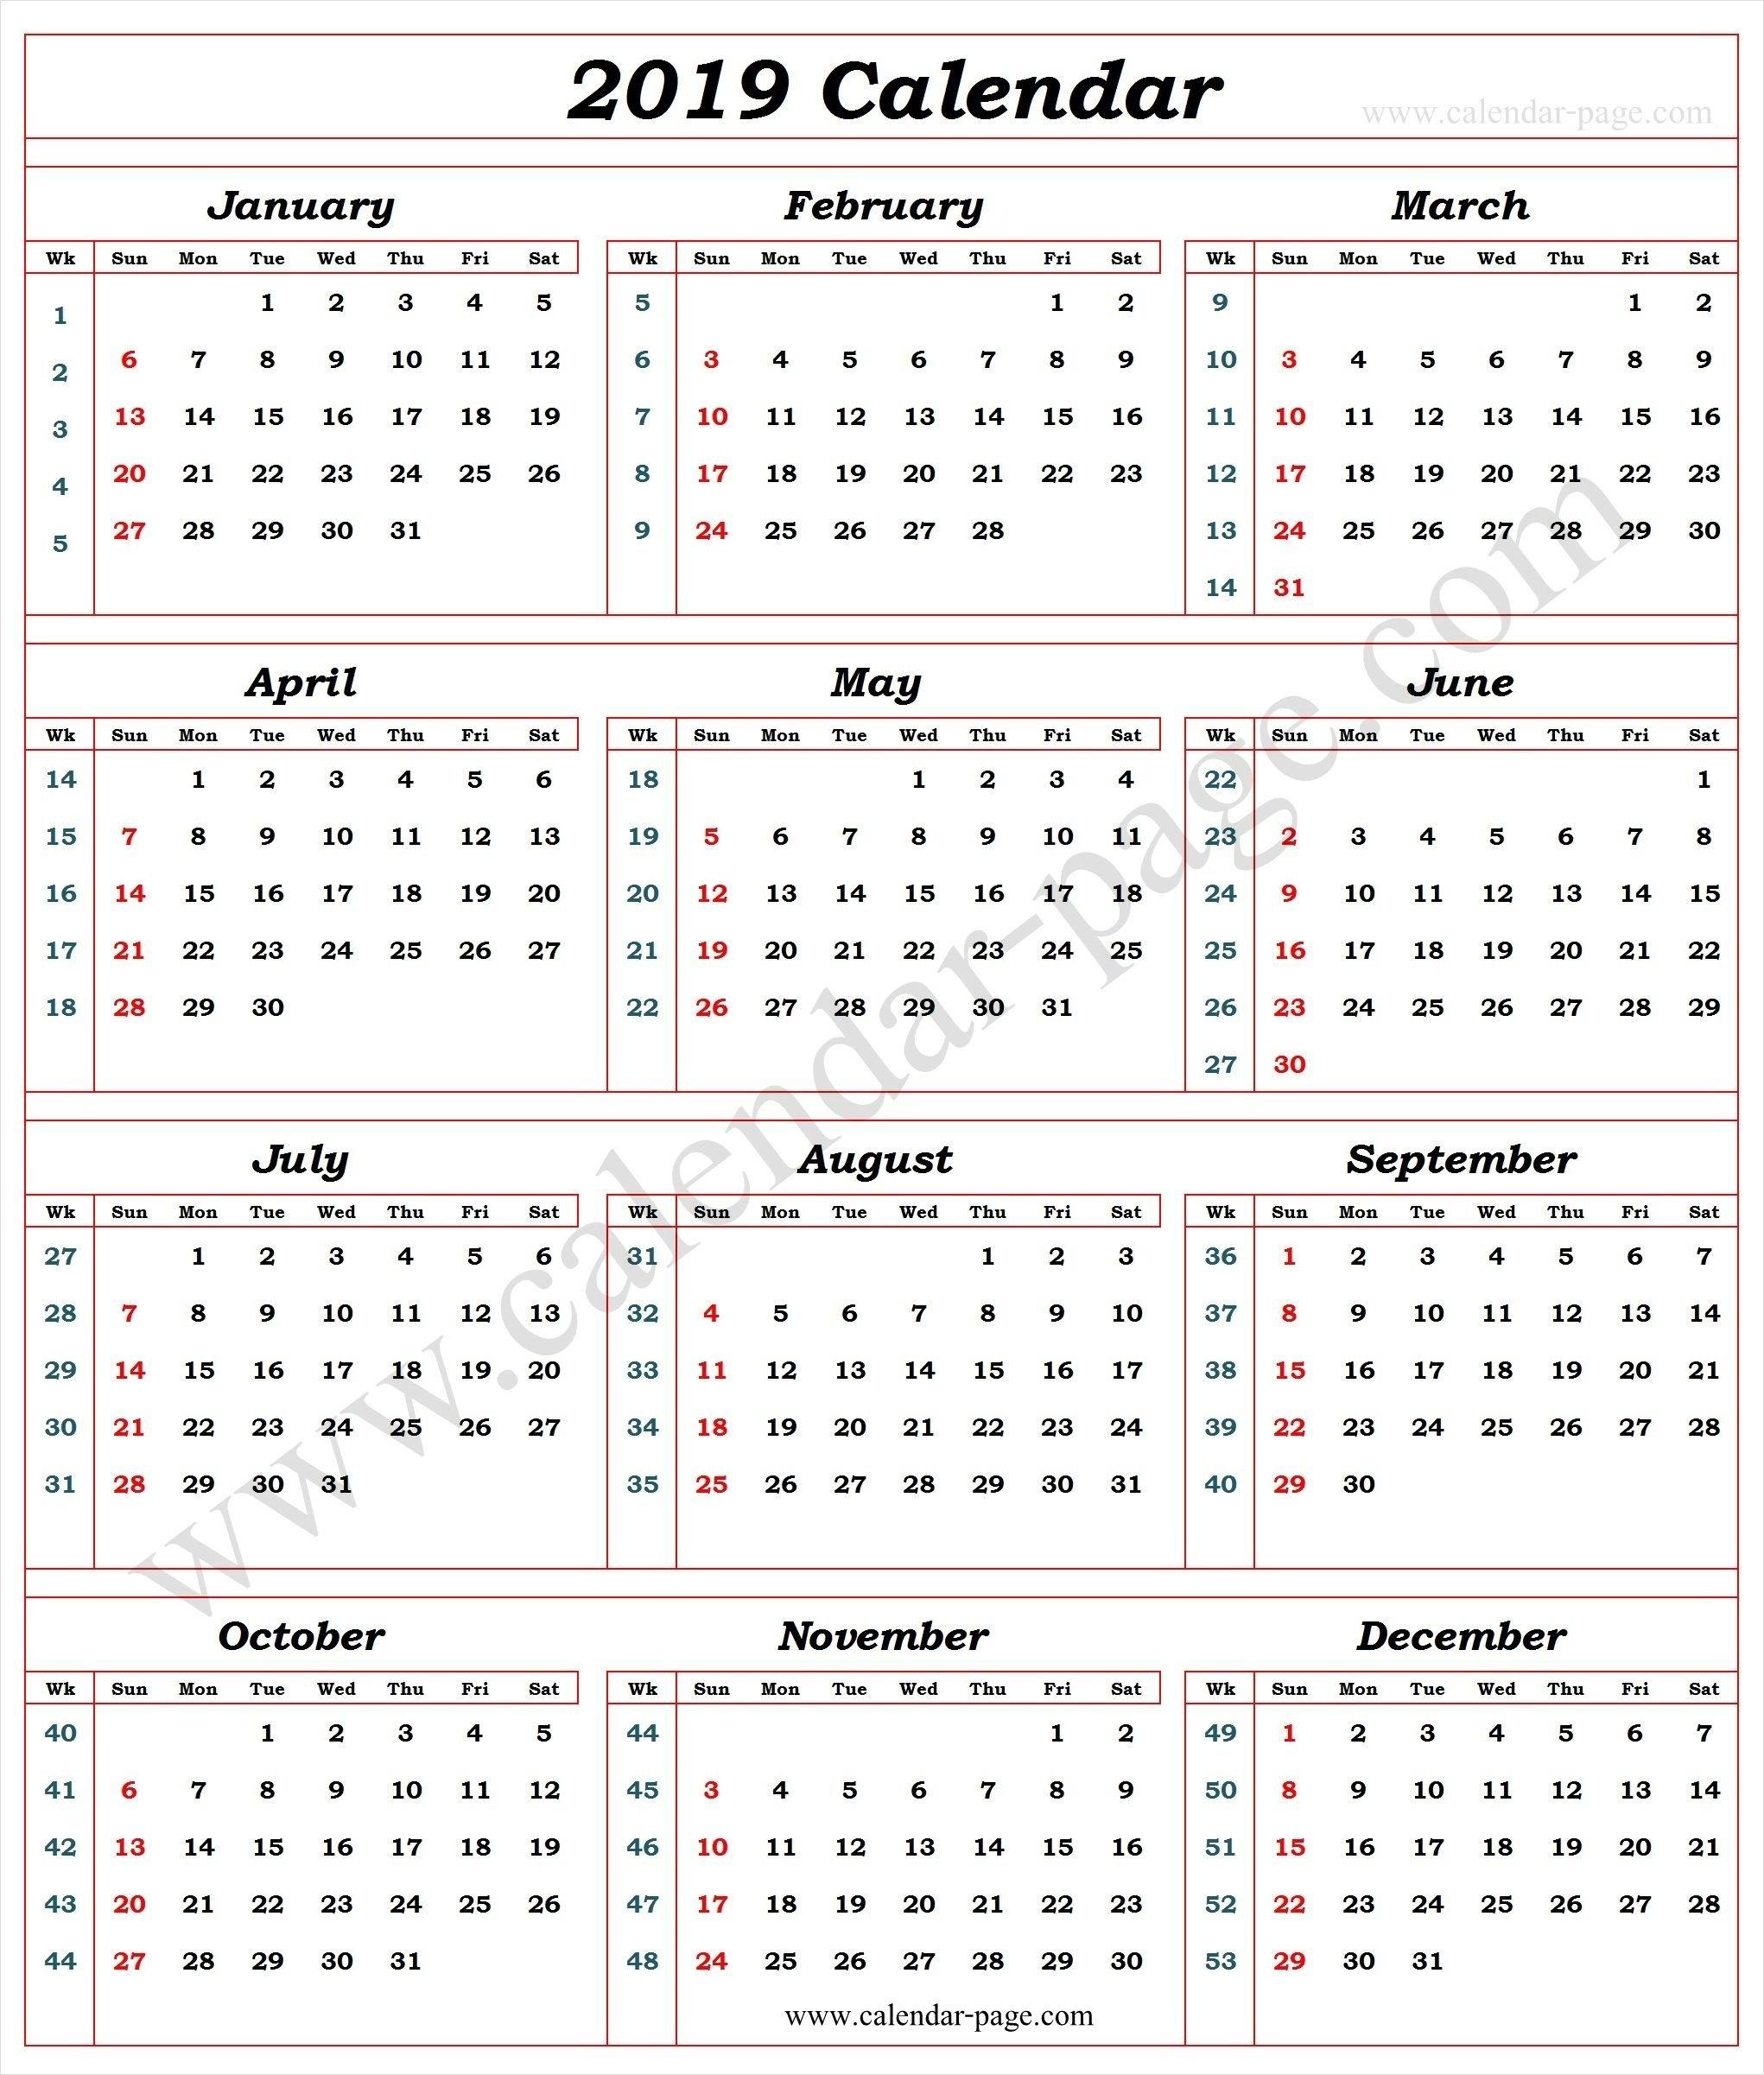 Calendar 2019 With Week Numbers | 2019 Calendar Template | Pinterest Calendar Week 7 2019